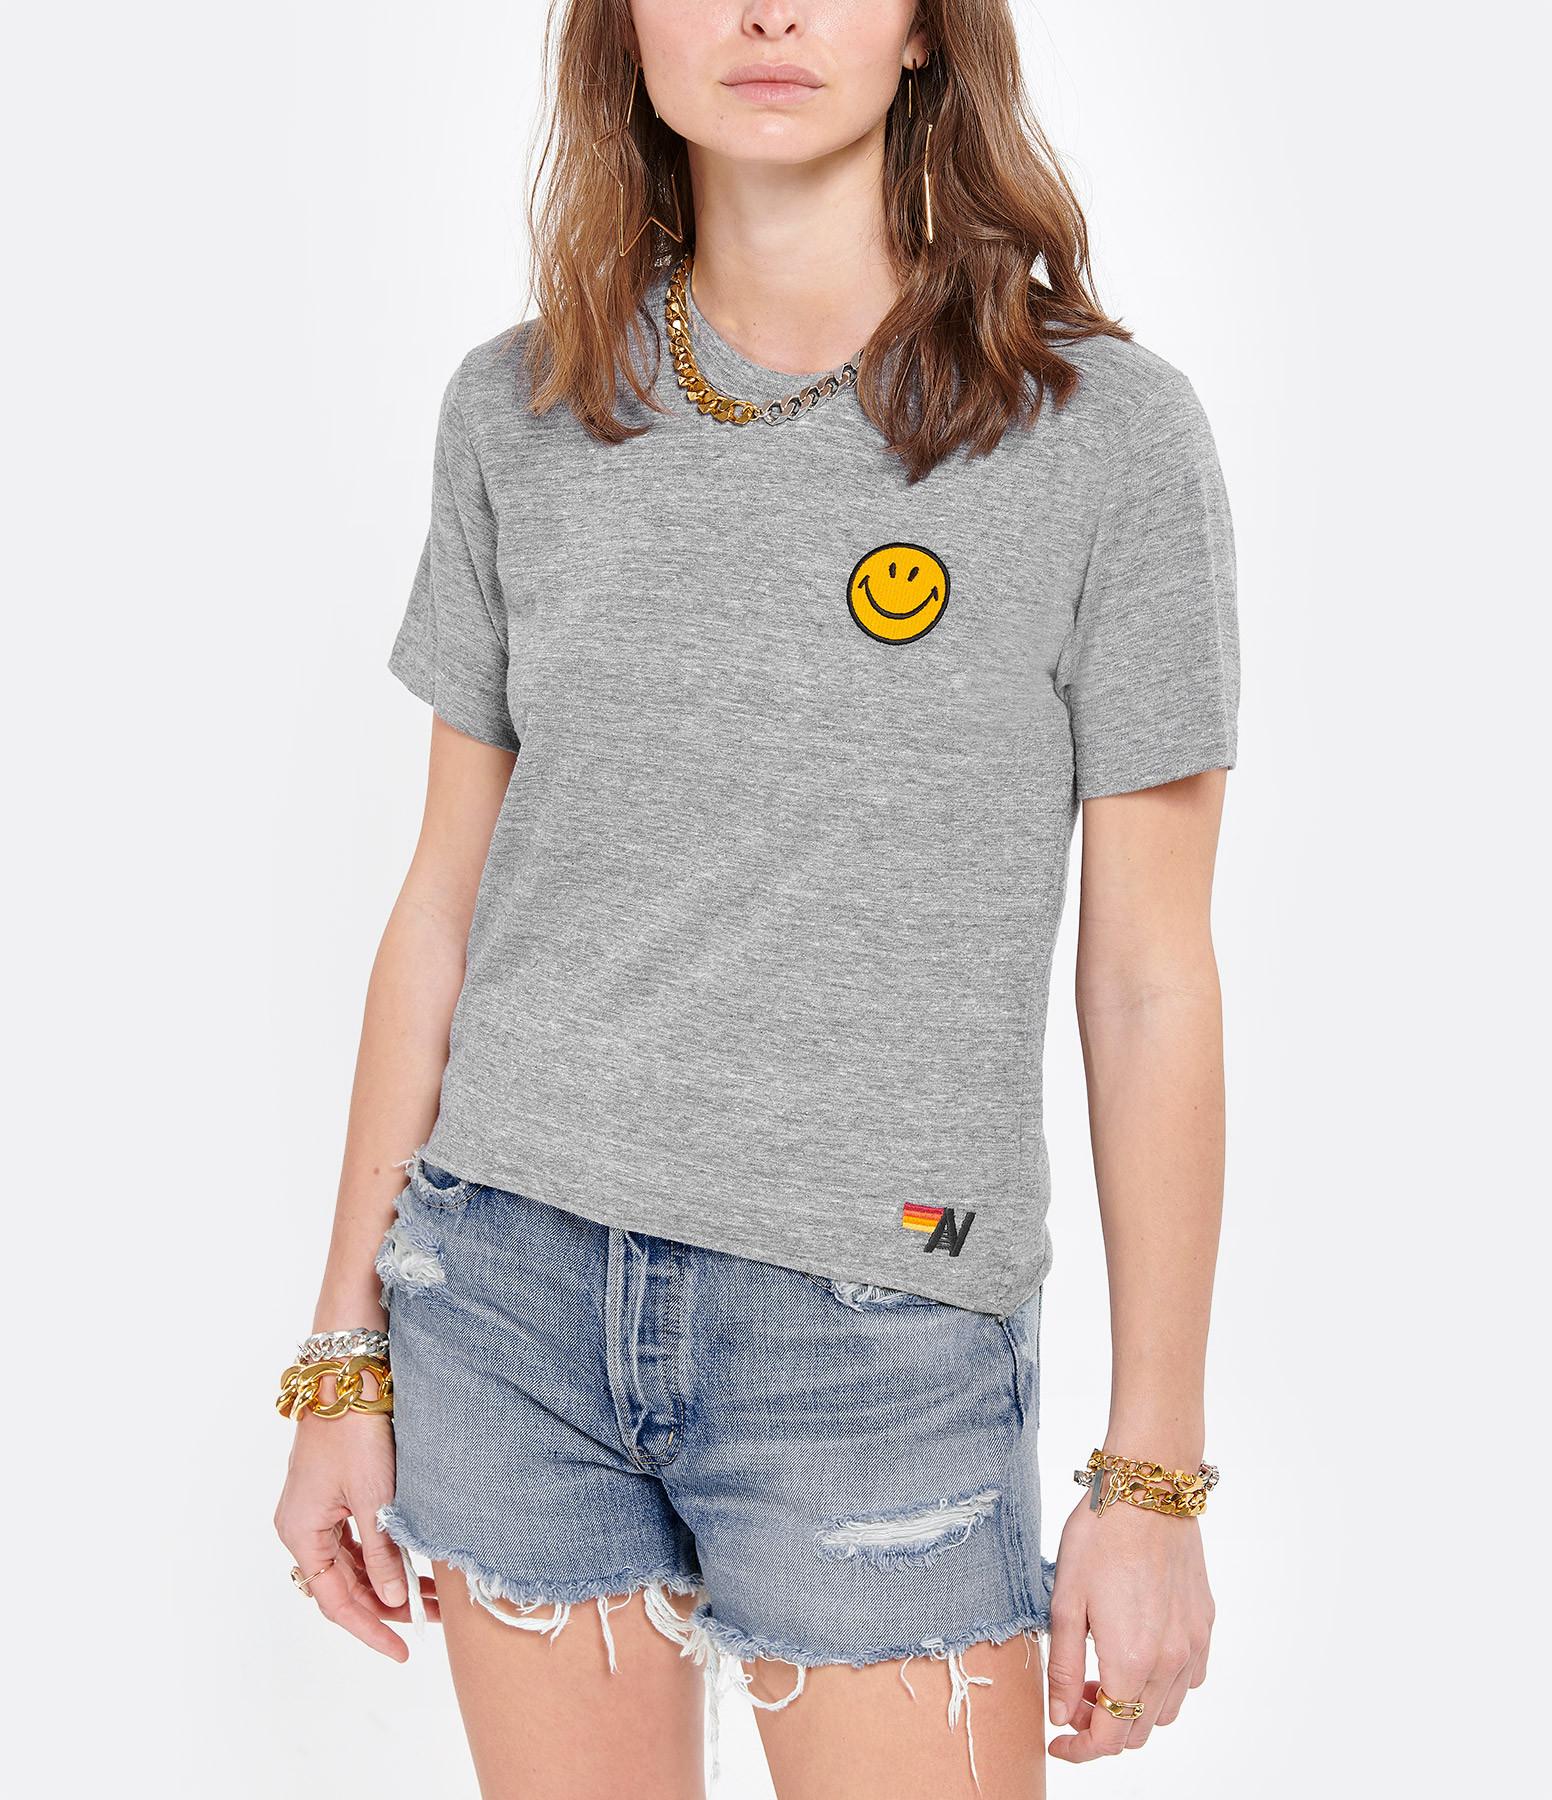 AVIATOR NATION - Tee-shirt Smiley Brodé Gris Chiné